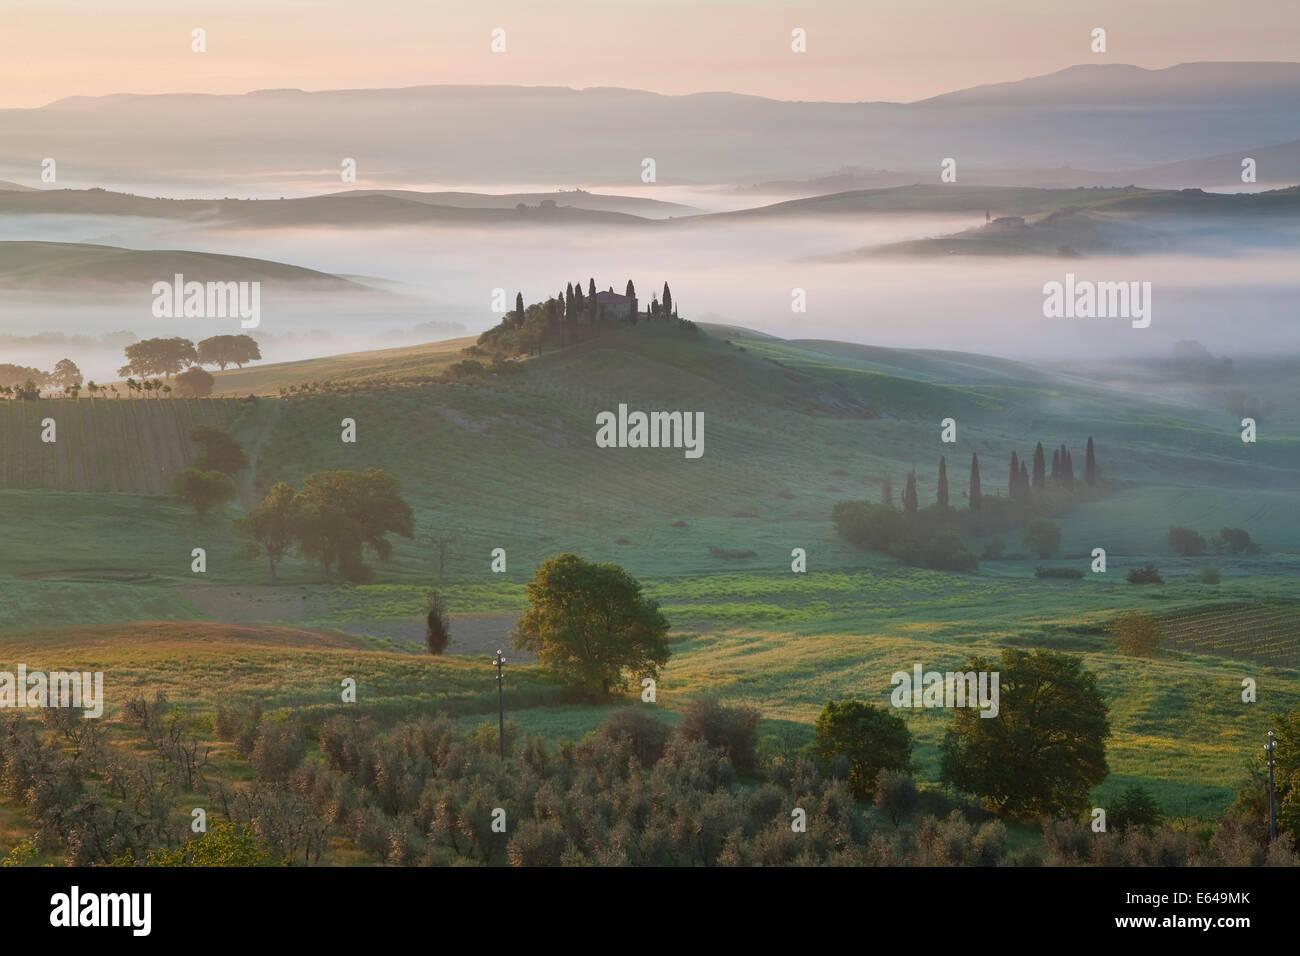 Agriturismo in valle, Val d'Orcia, Toscana, Italia Immagini Stock